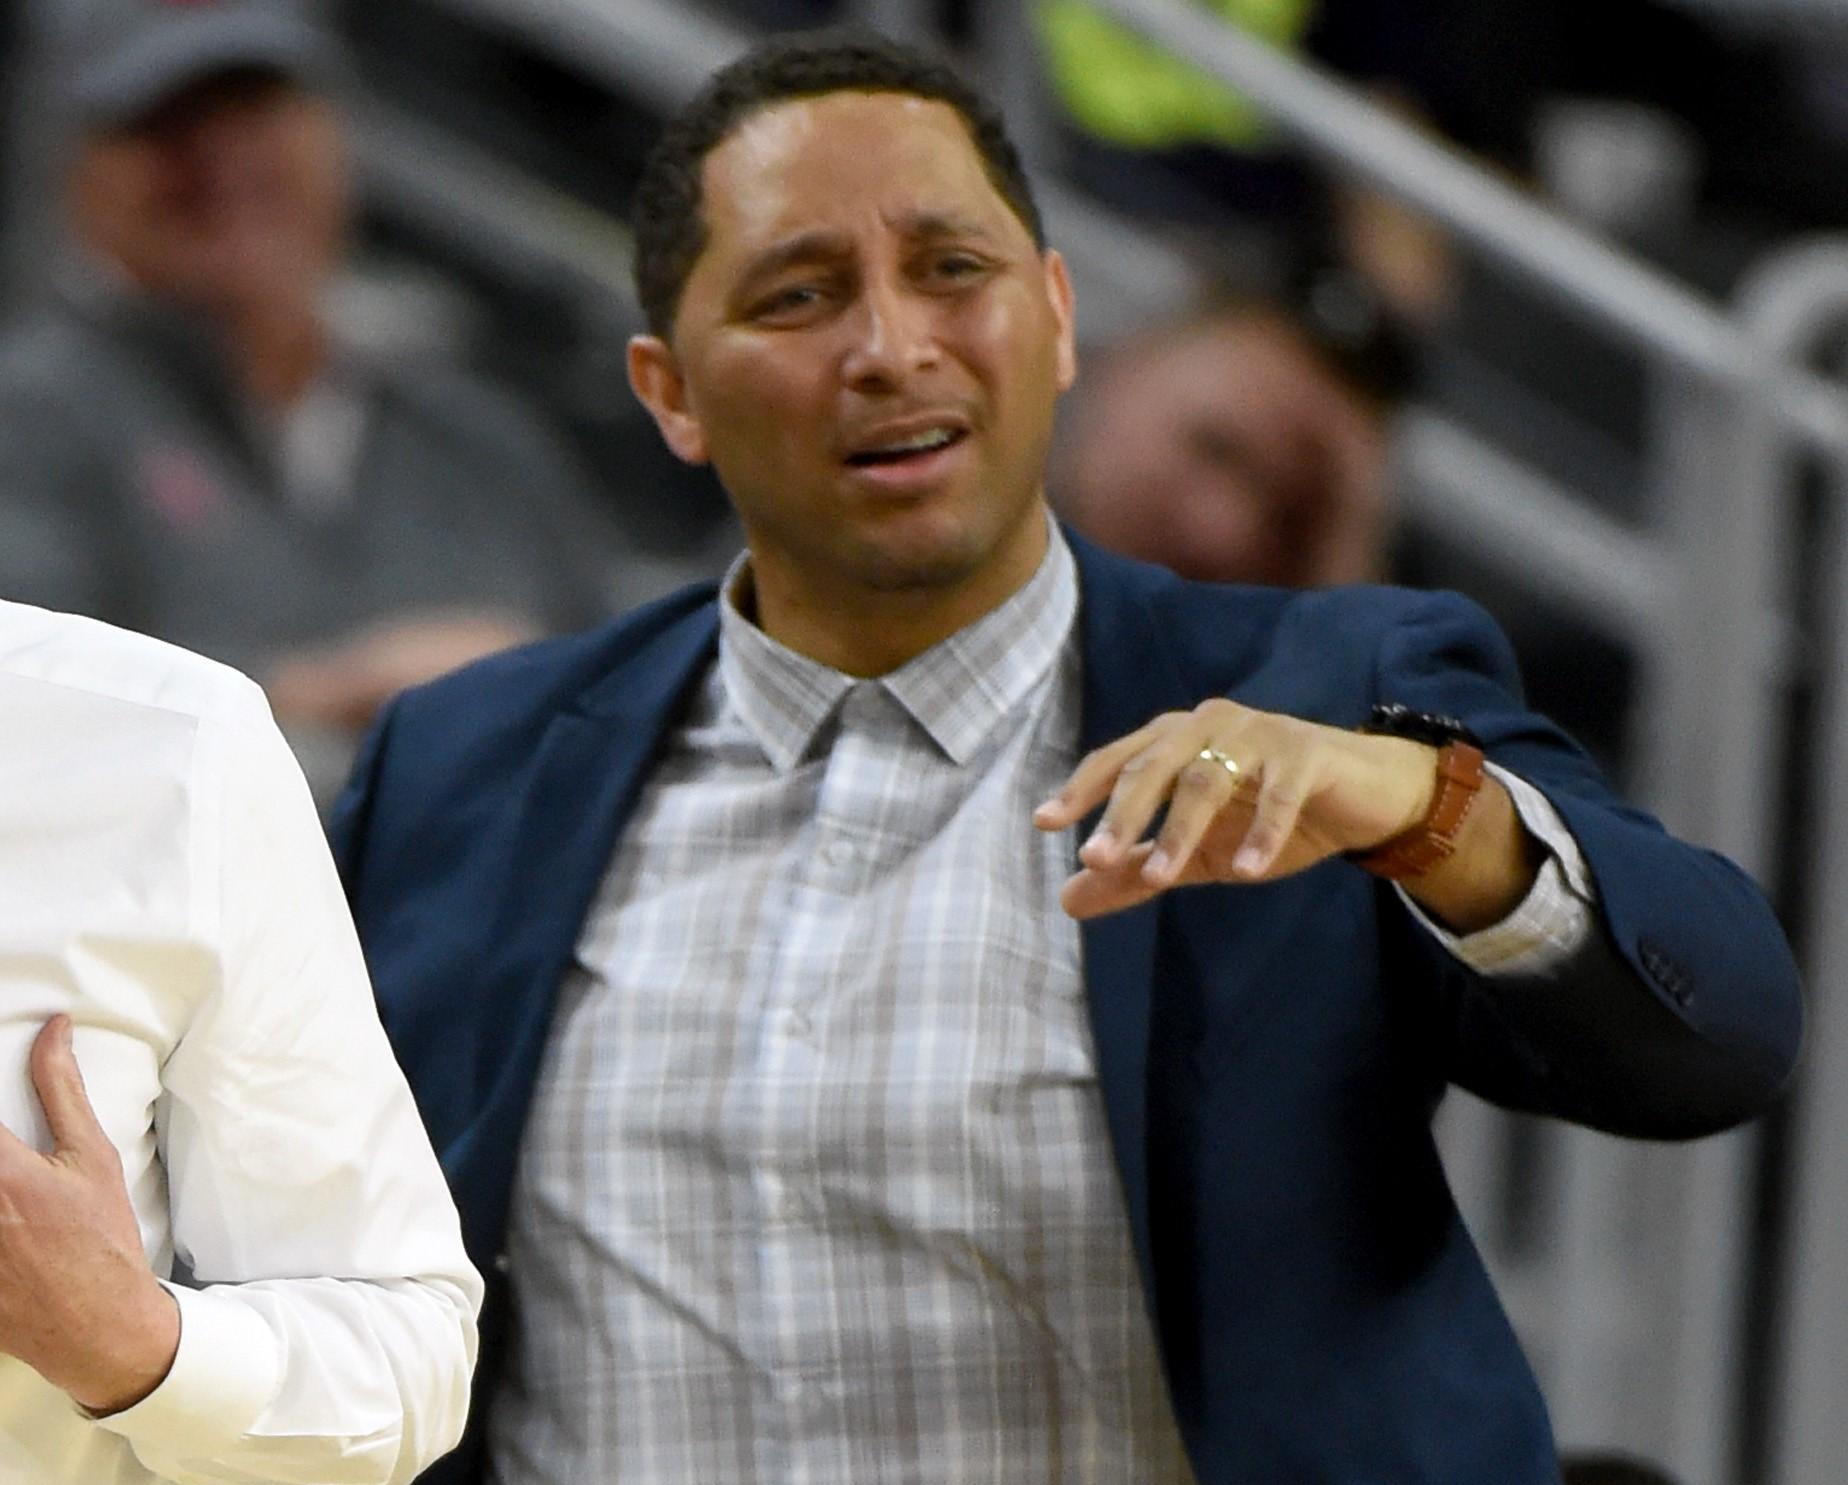 associate head coach Tony Bland of the USC Trojans